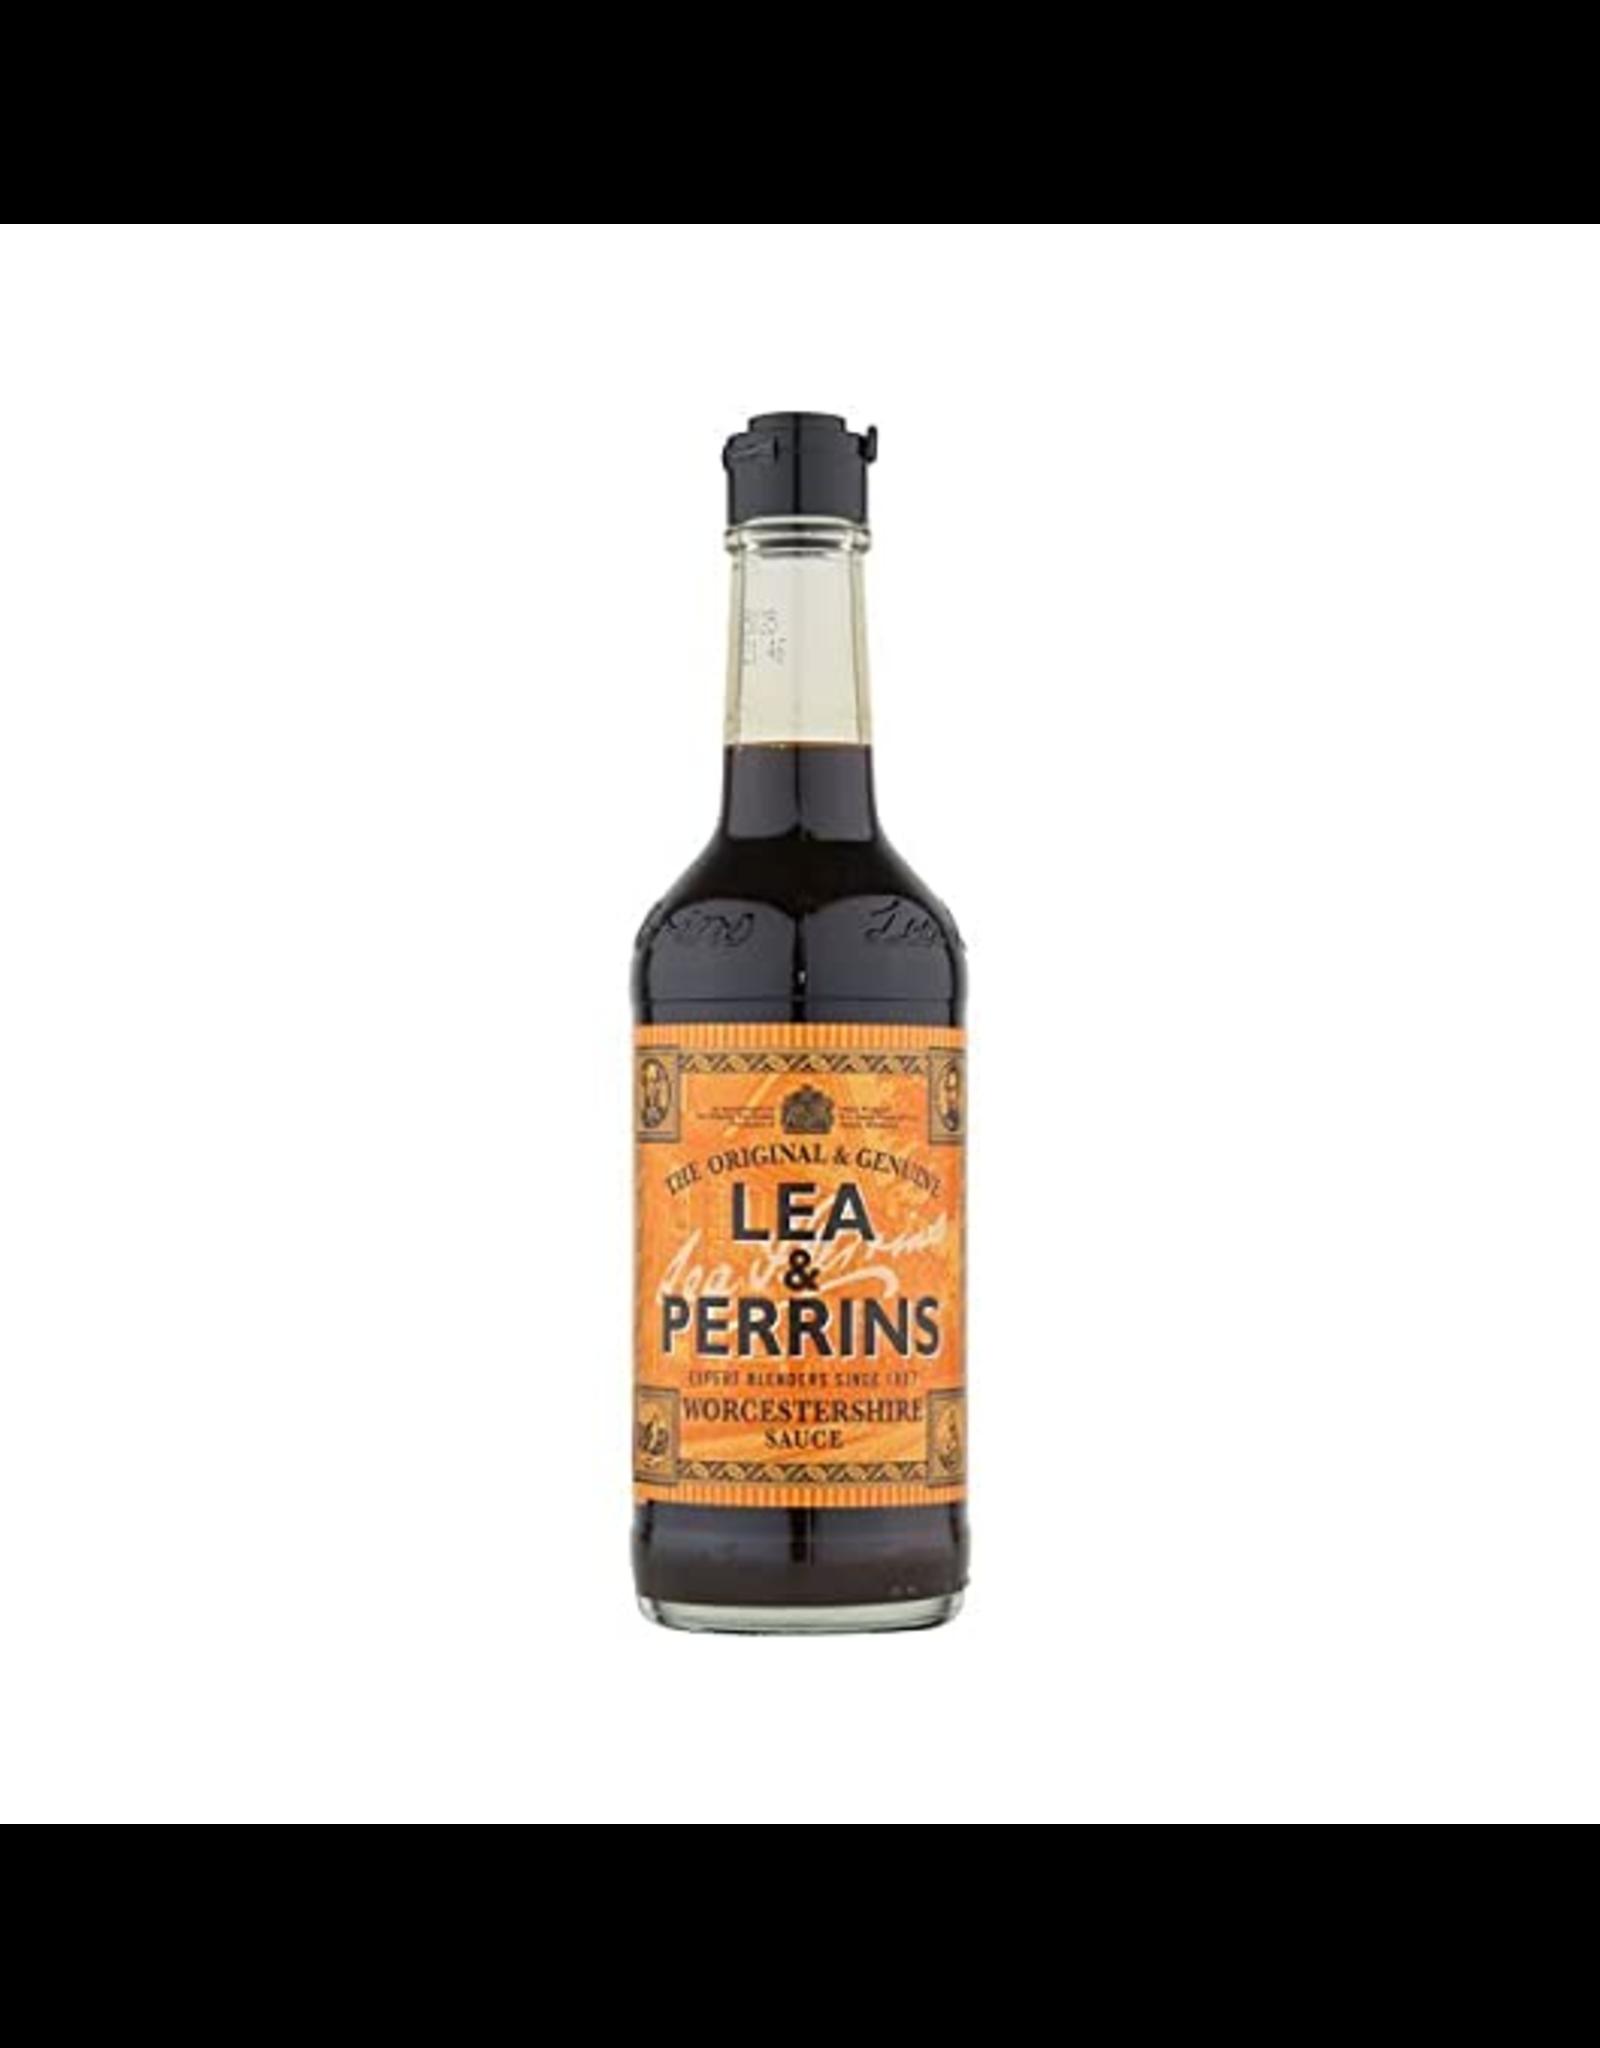 The Original & Geniune Lea & Perrins Worcestershire Sauce